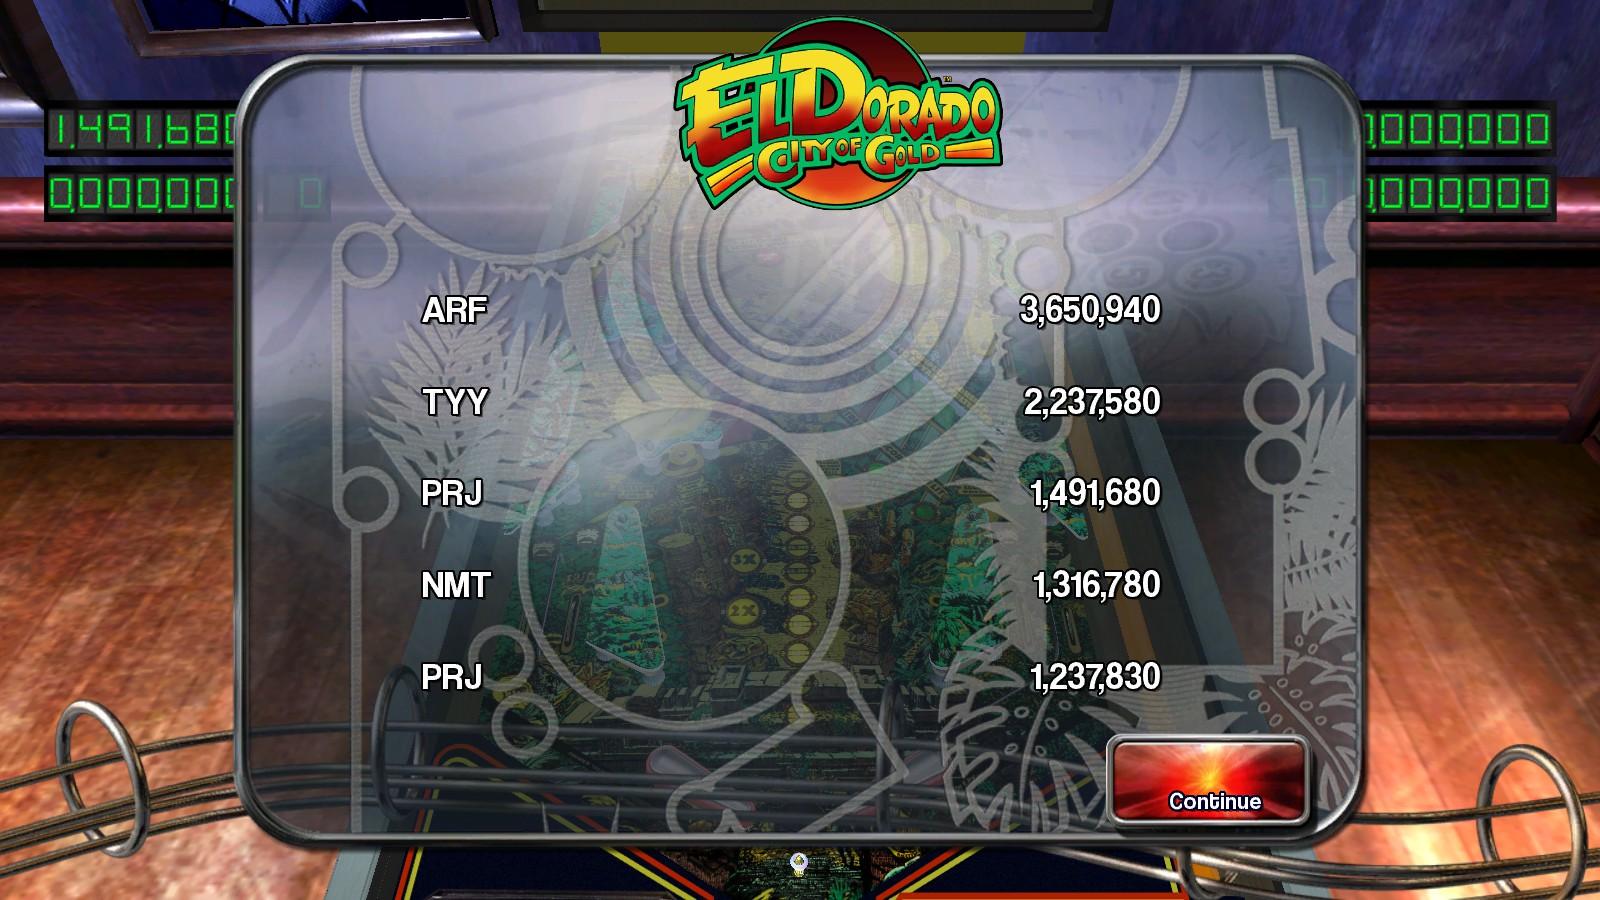 Deteacher: Pinball Arcade: El Dorado: City of Gold (PC) 1,491,680 points on 2015-08-22 17:33:24